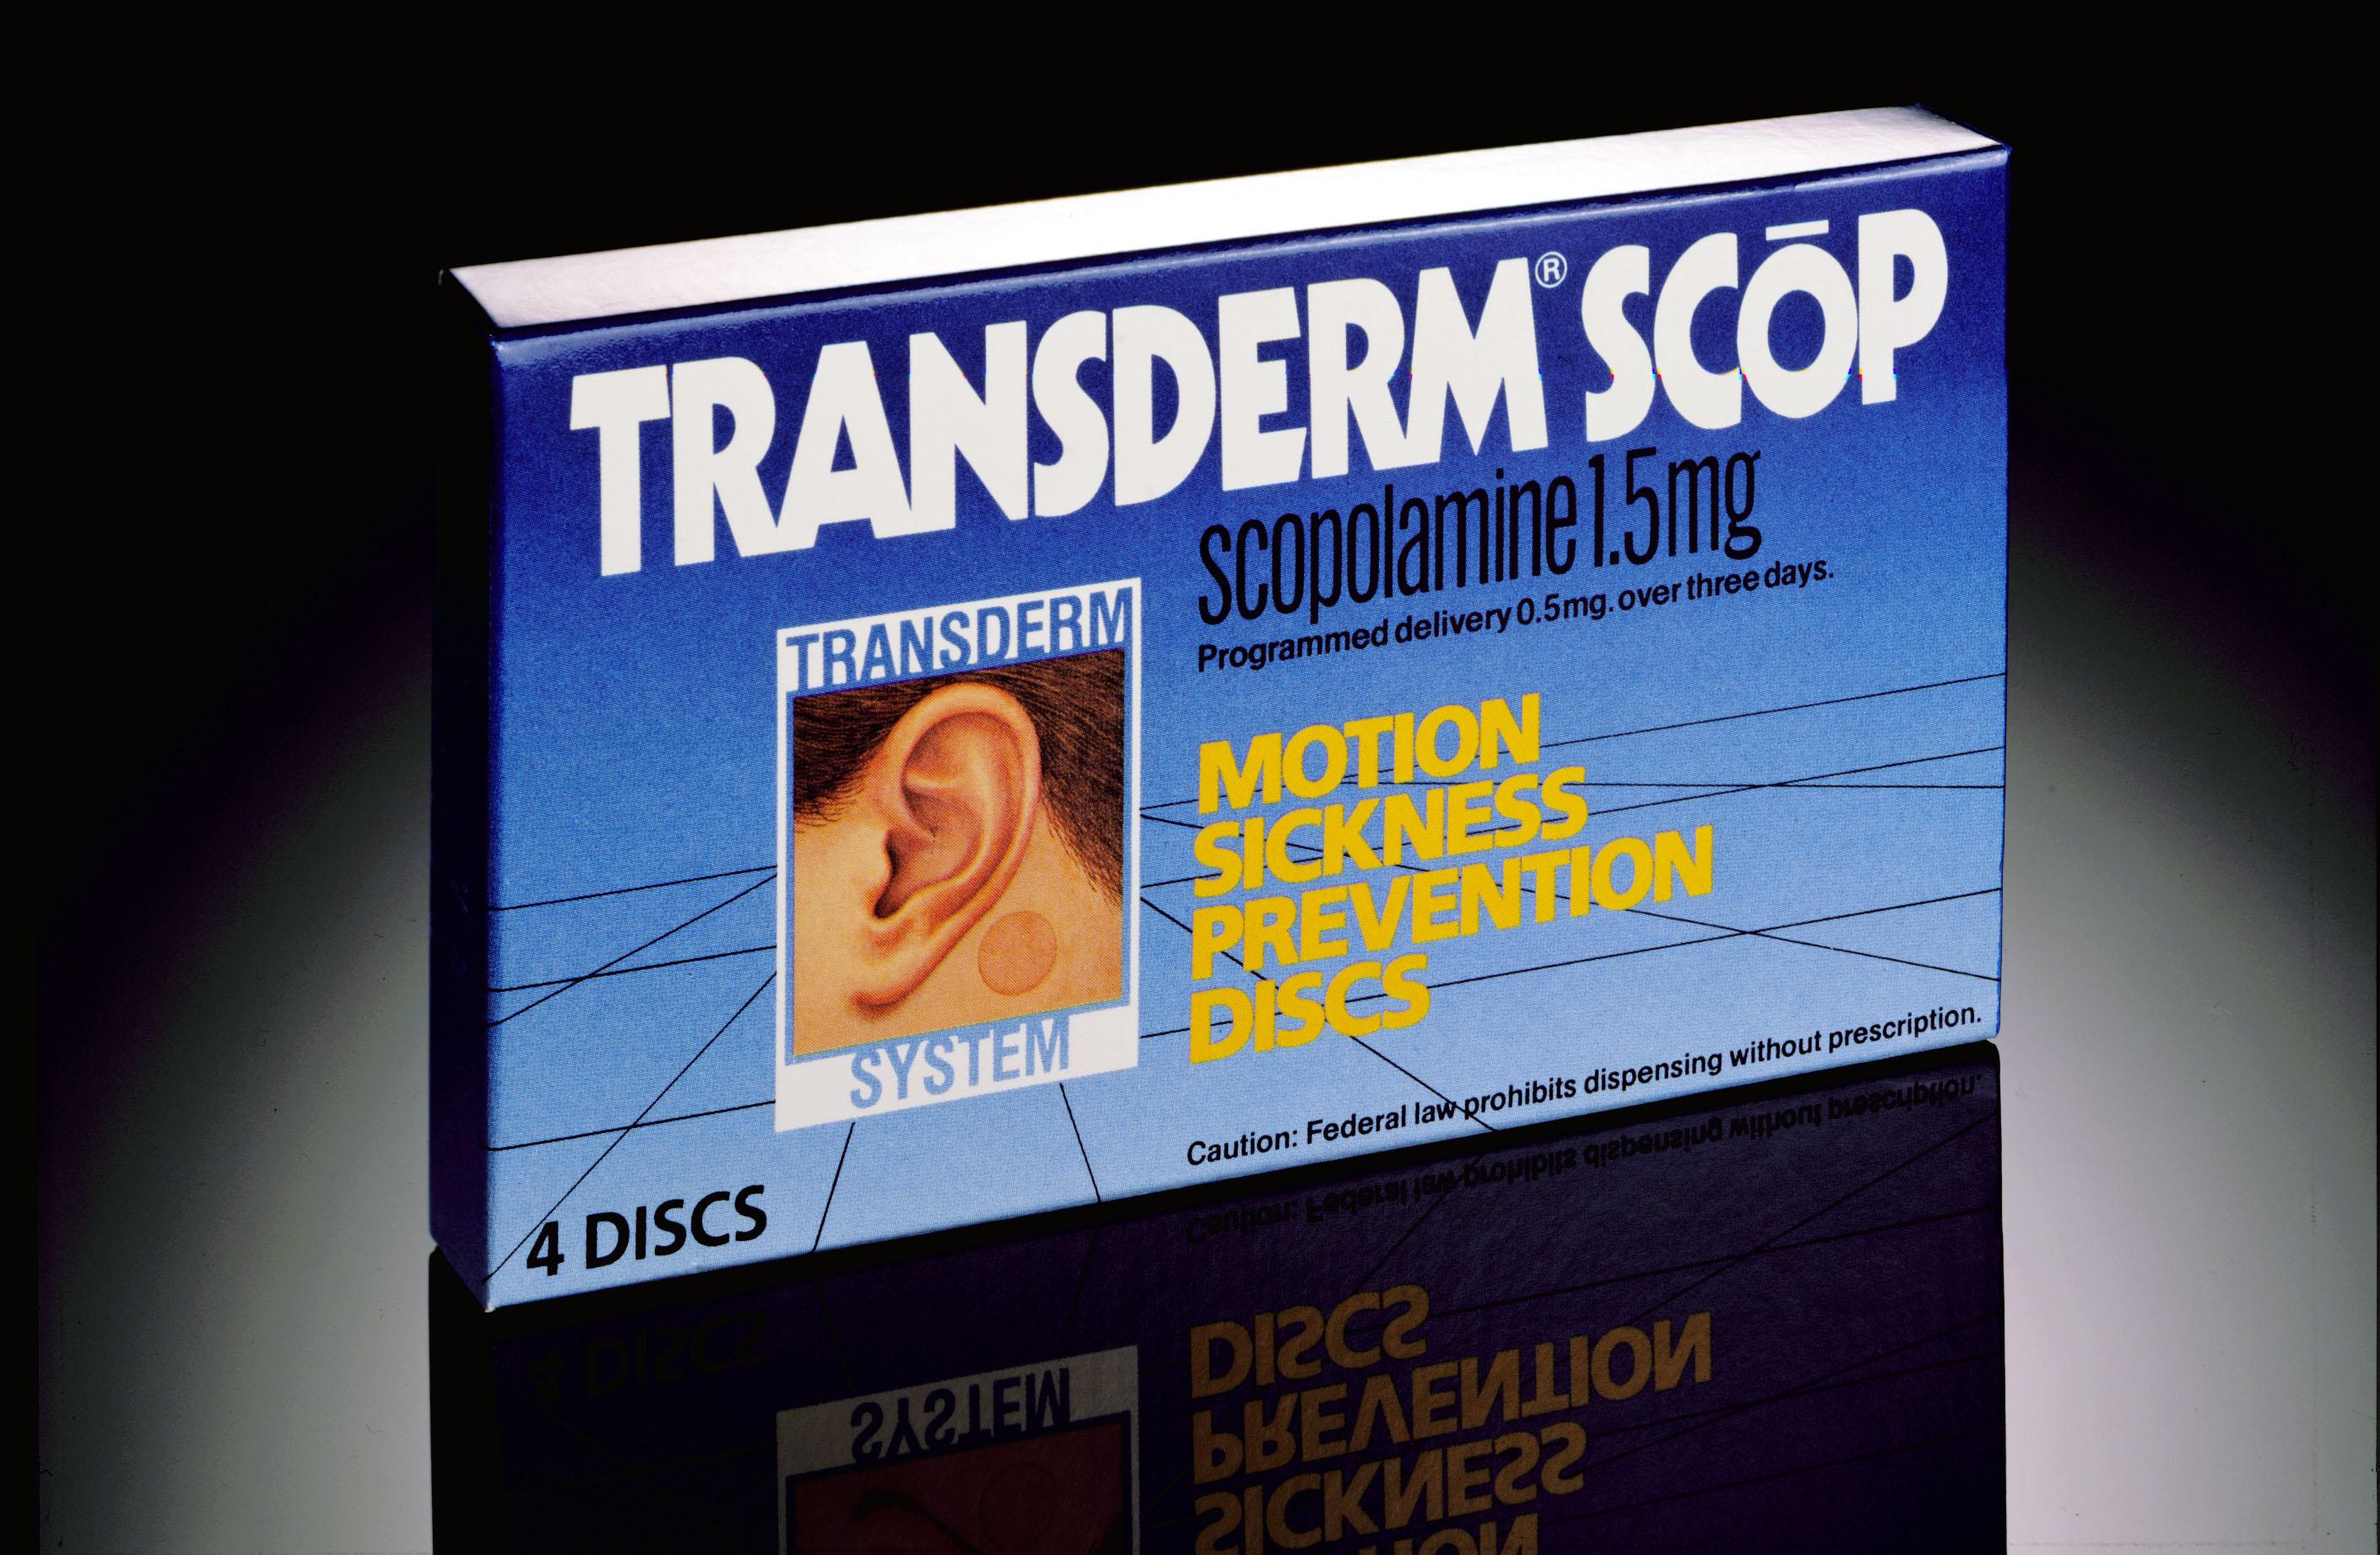 Transderm-Scop 1.5 Patch